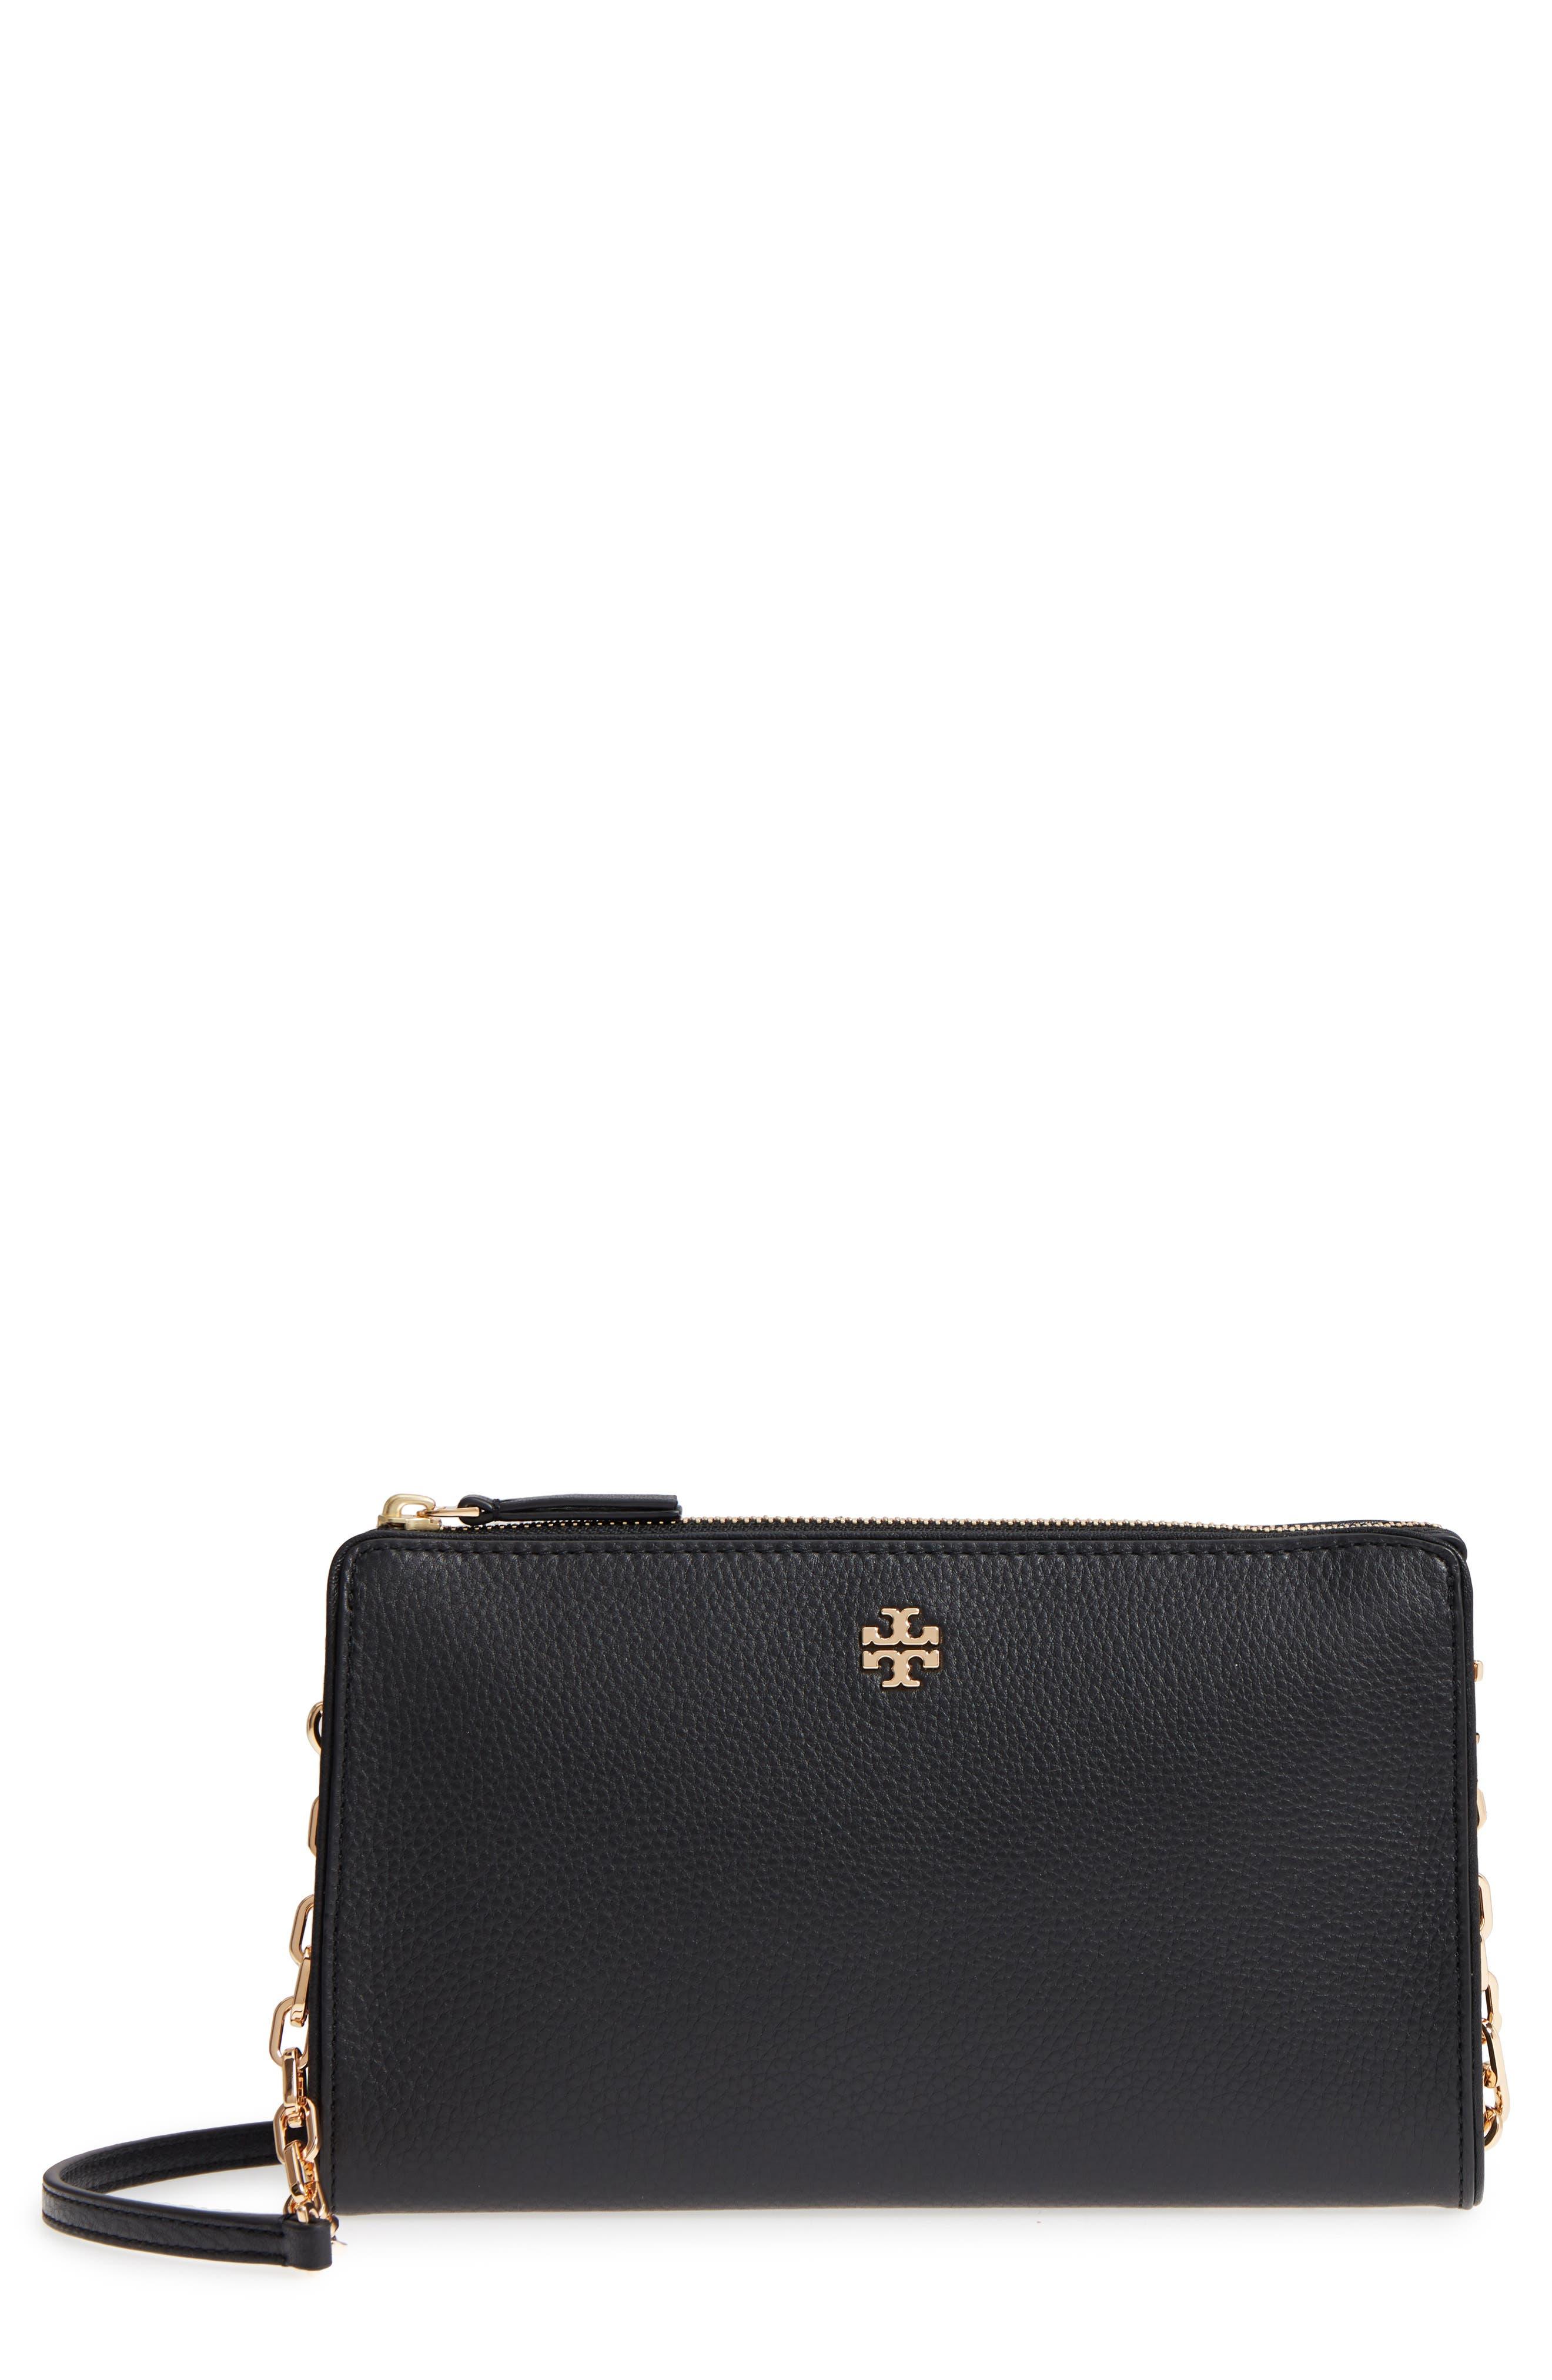 Marsden Leather Wallet Crossbody Bag,                             Main thumbnail 1, color,                             Black